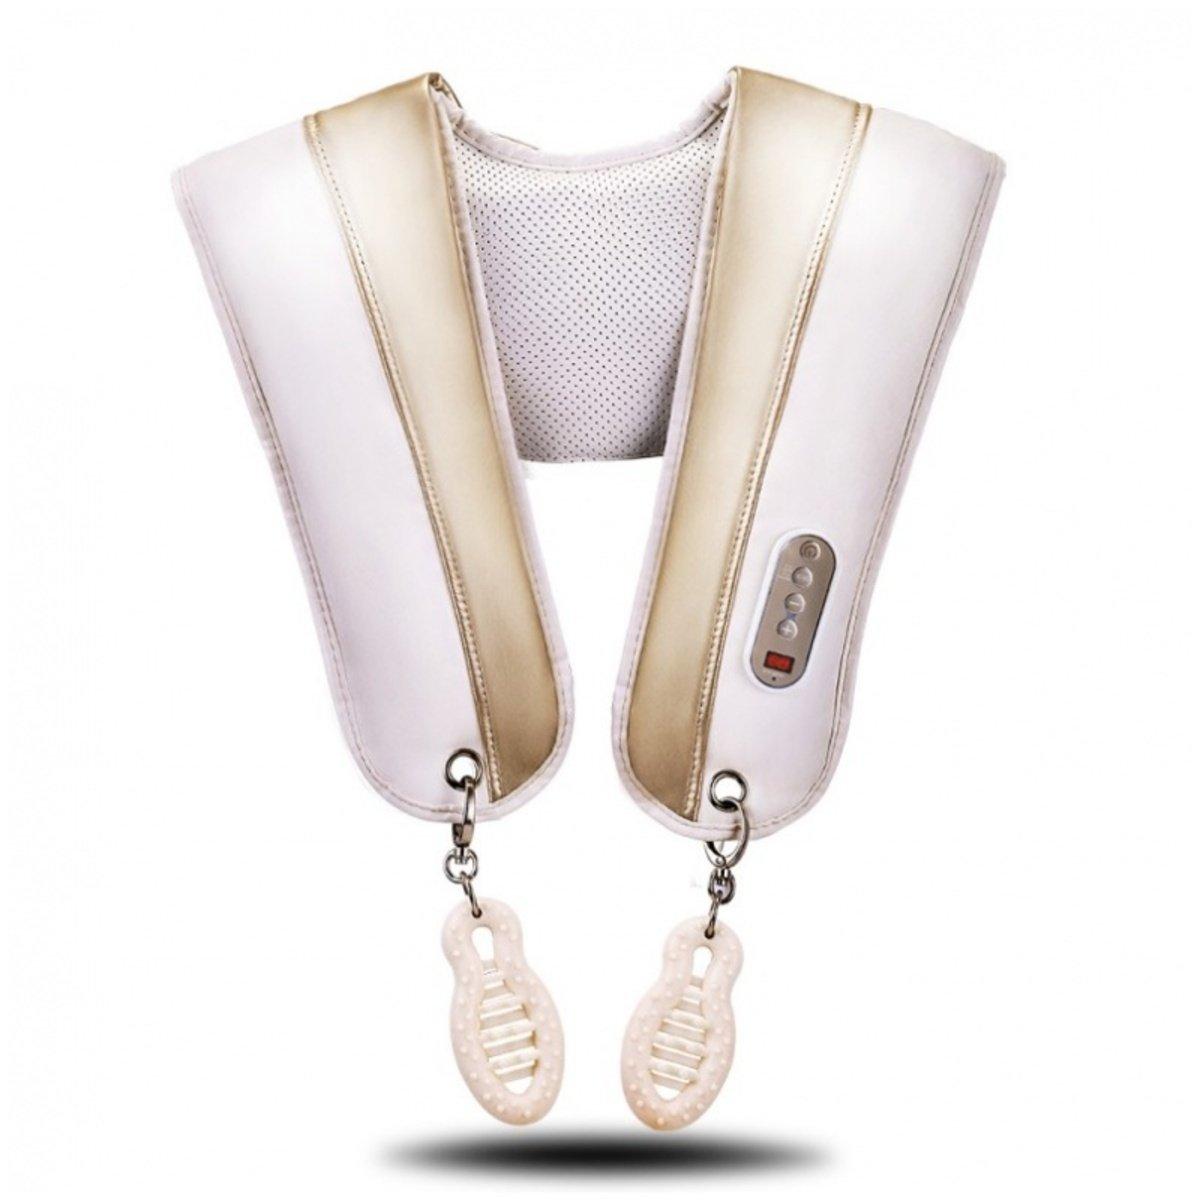 SKG 70W頸部和肩部按摩攻與手練習器